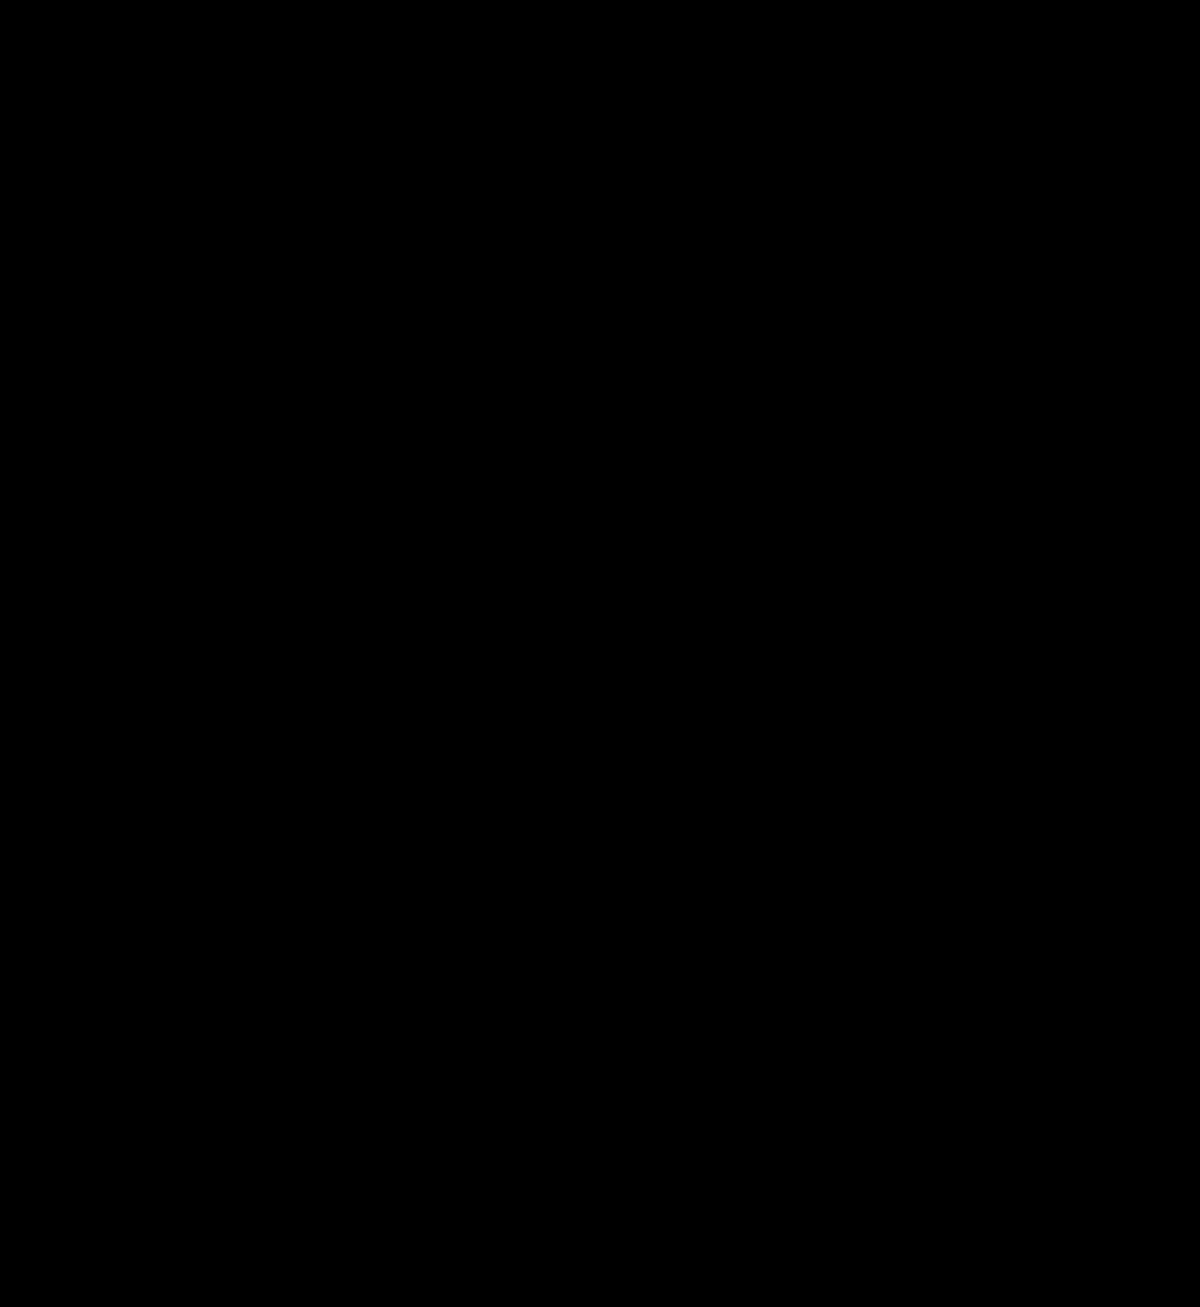 Skull-mountain-logo-BLACK.png